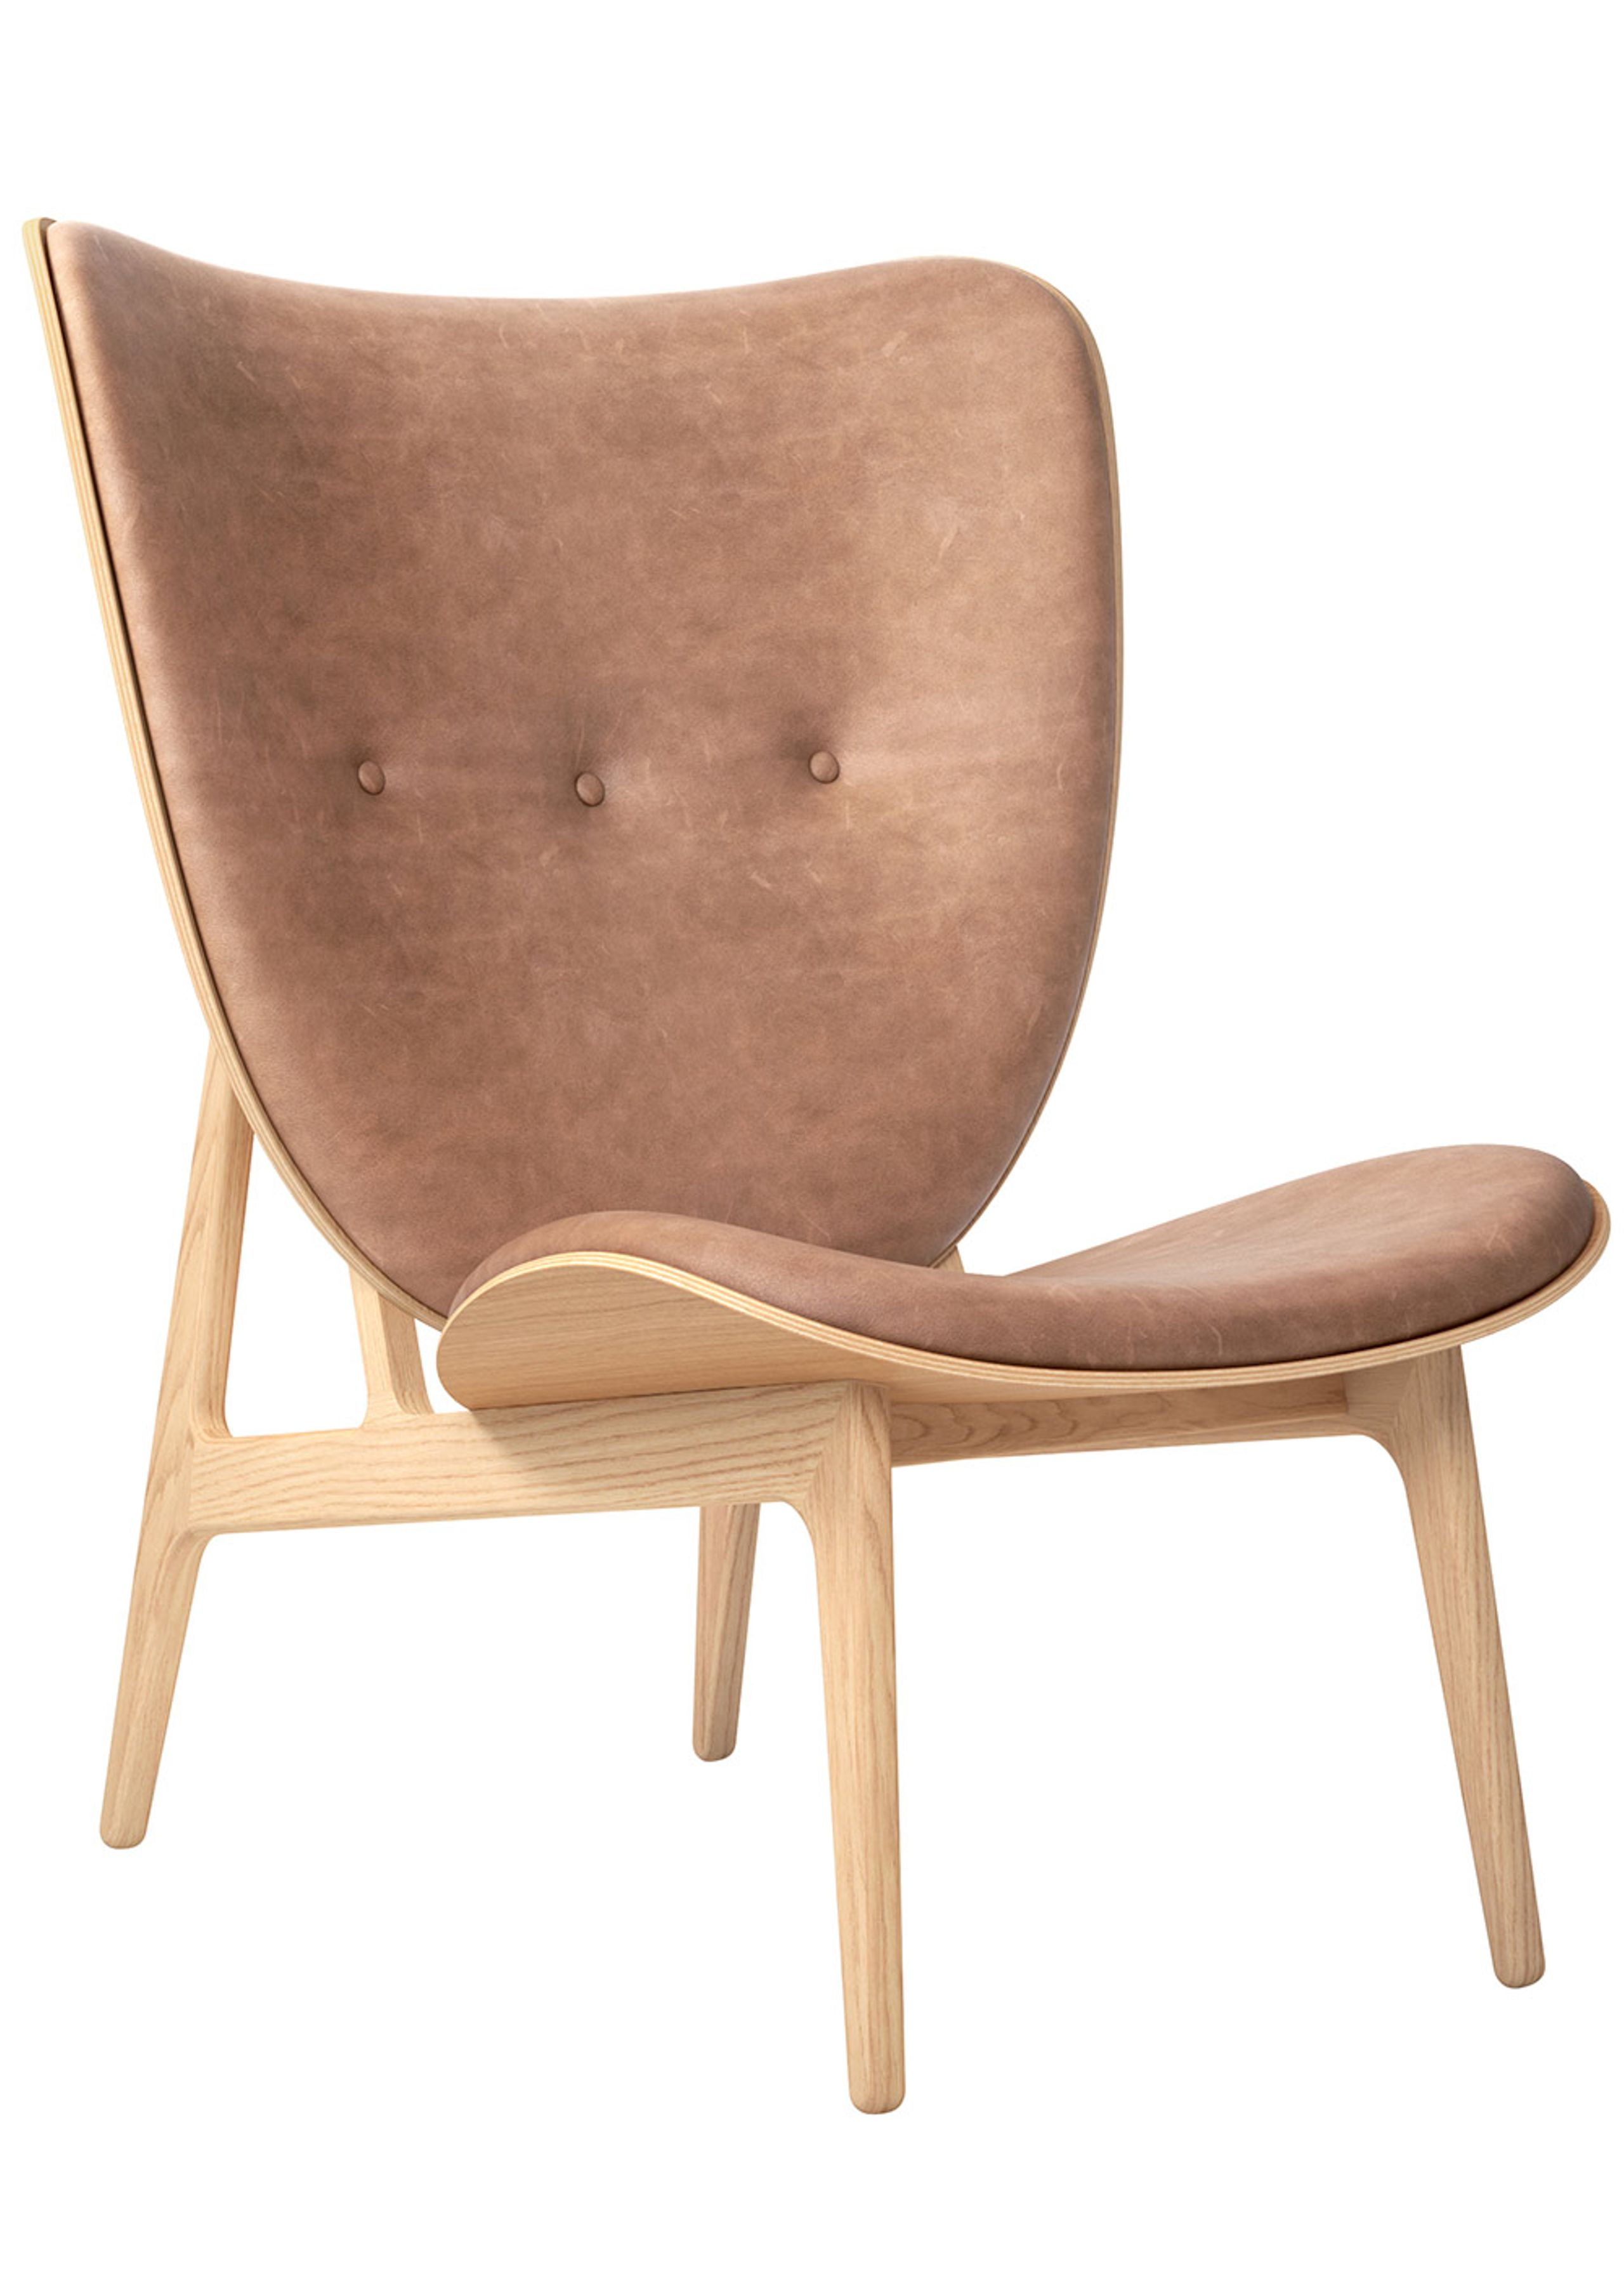 Elephant Chair Lenestol Norr11